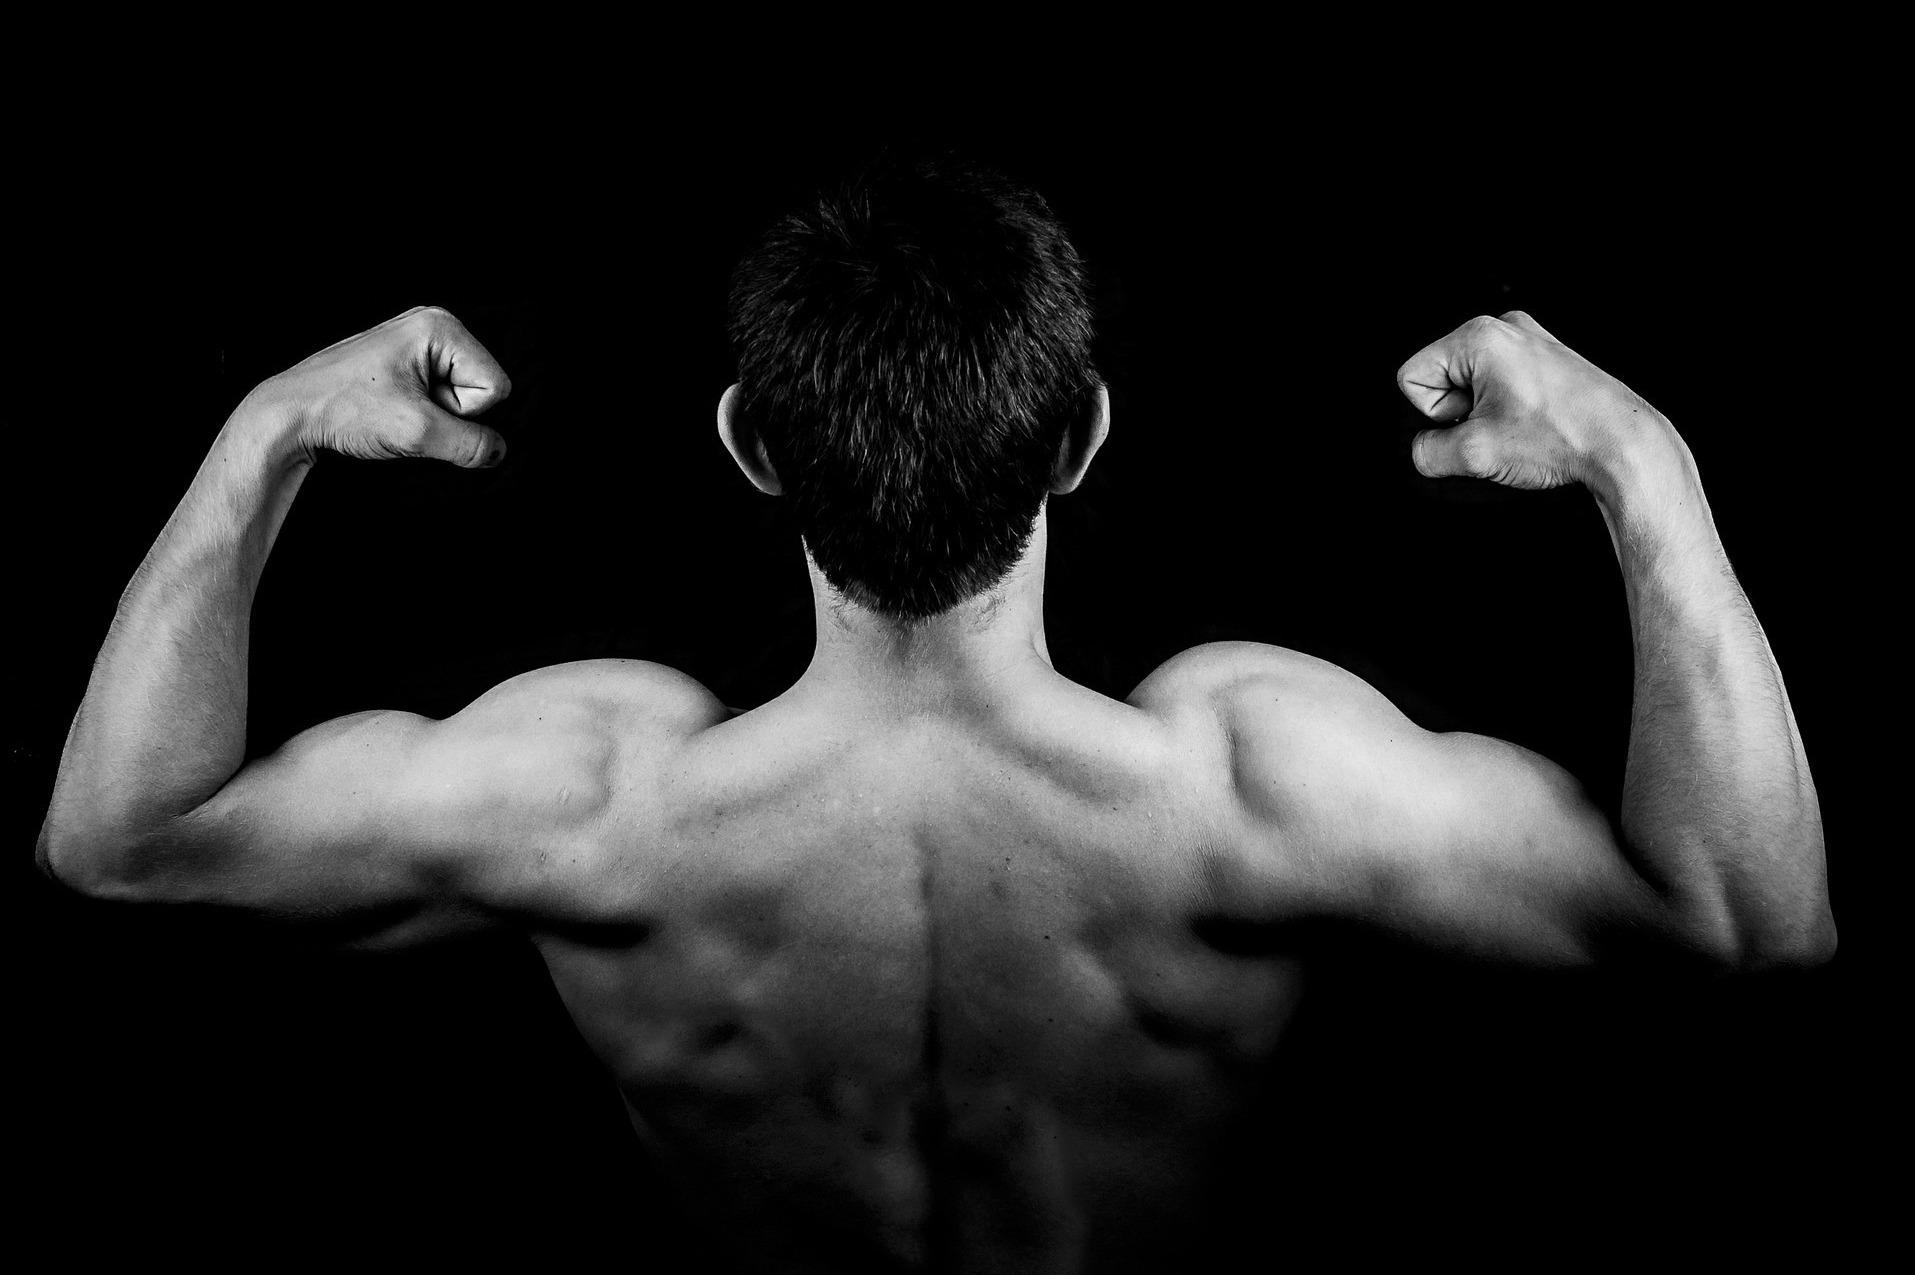 La detente musculaire